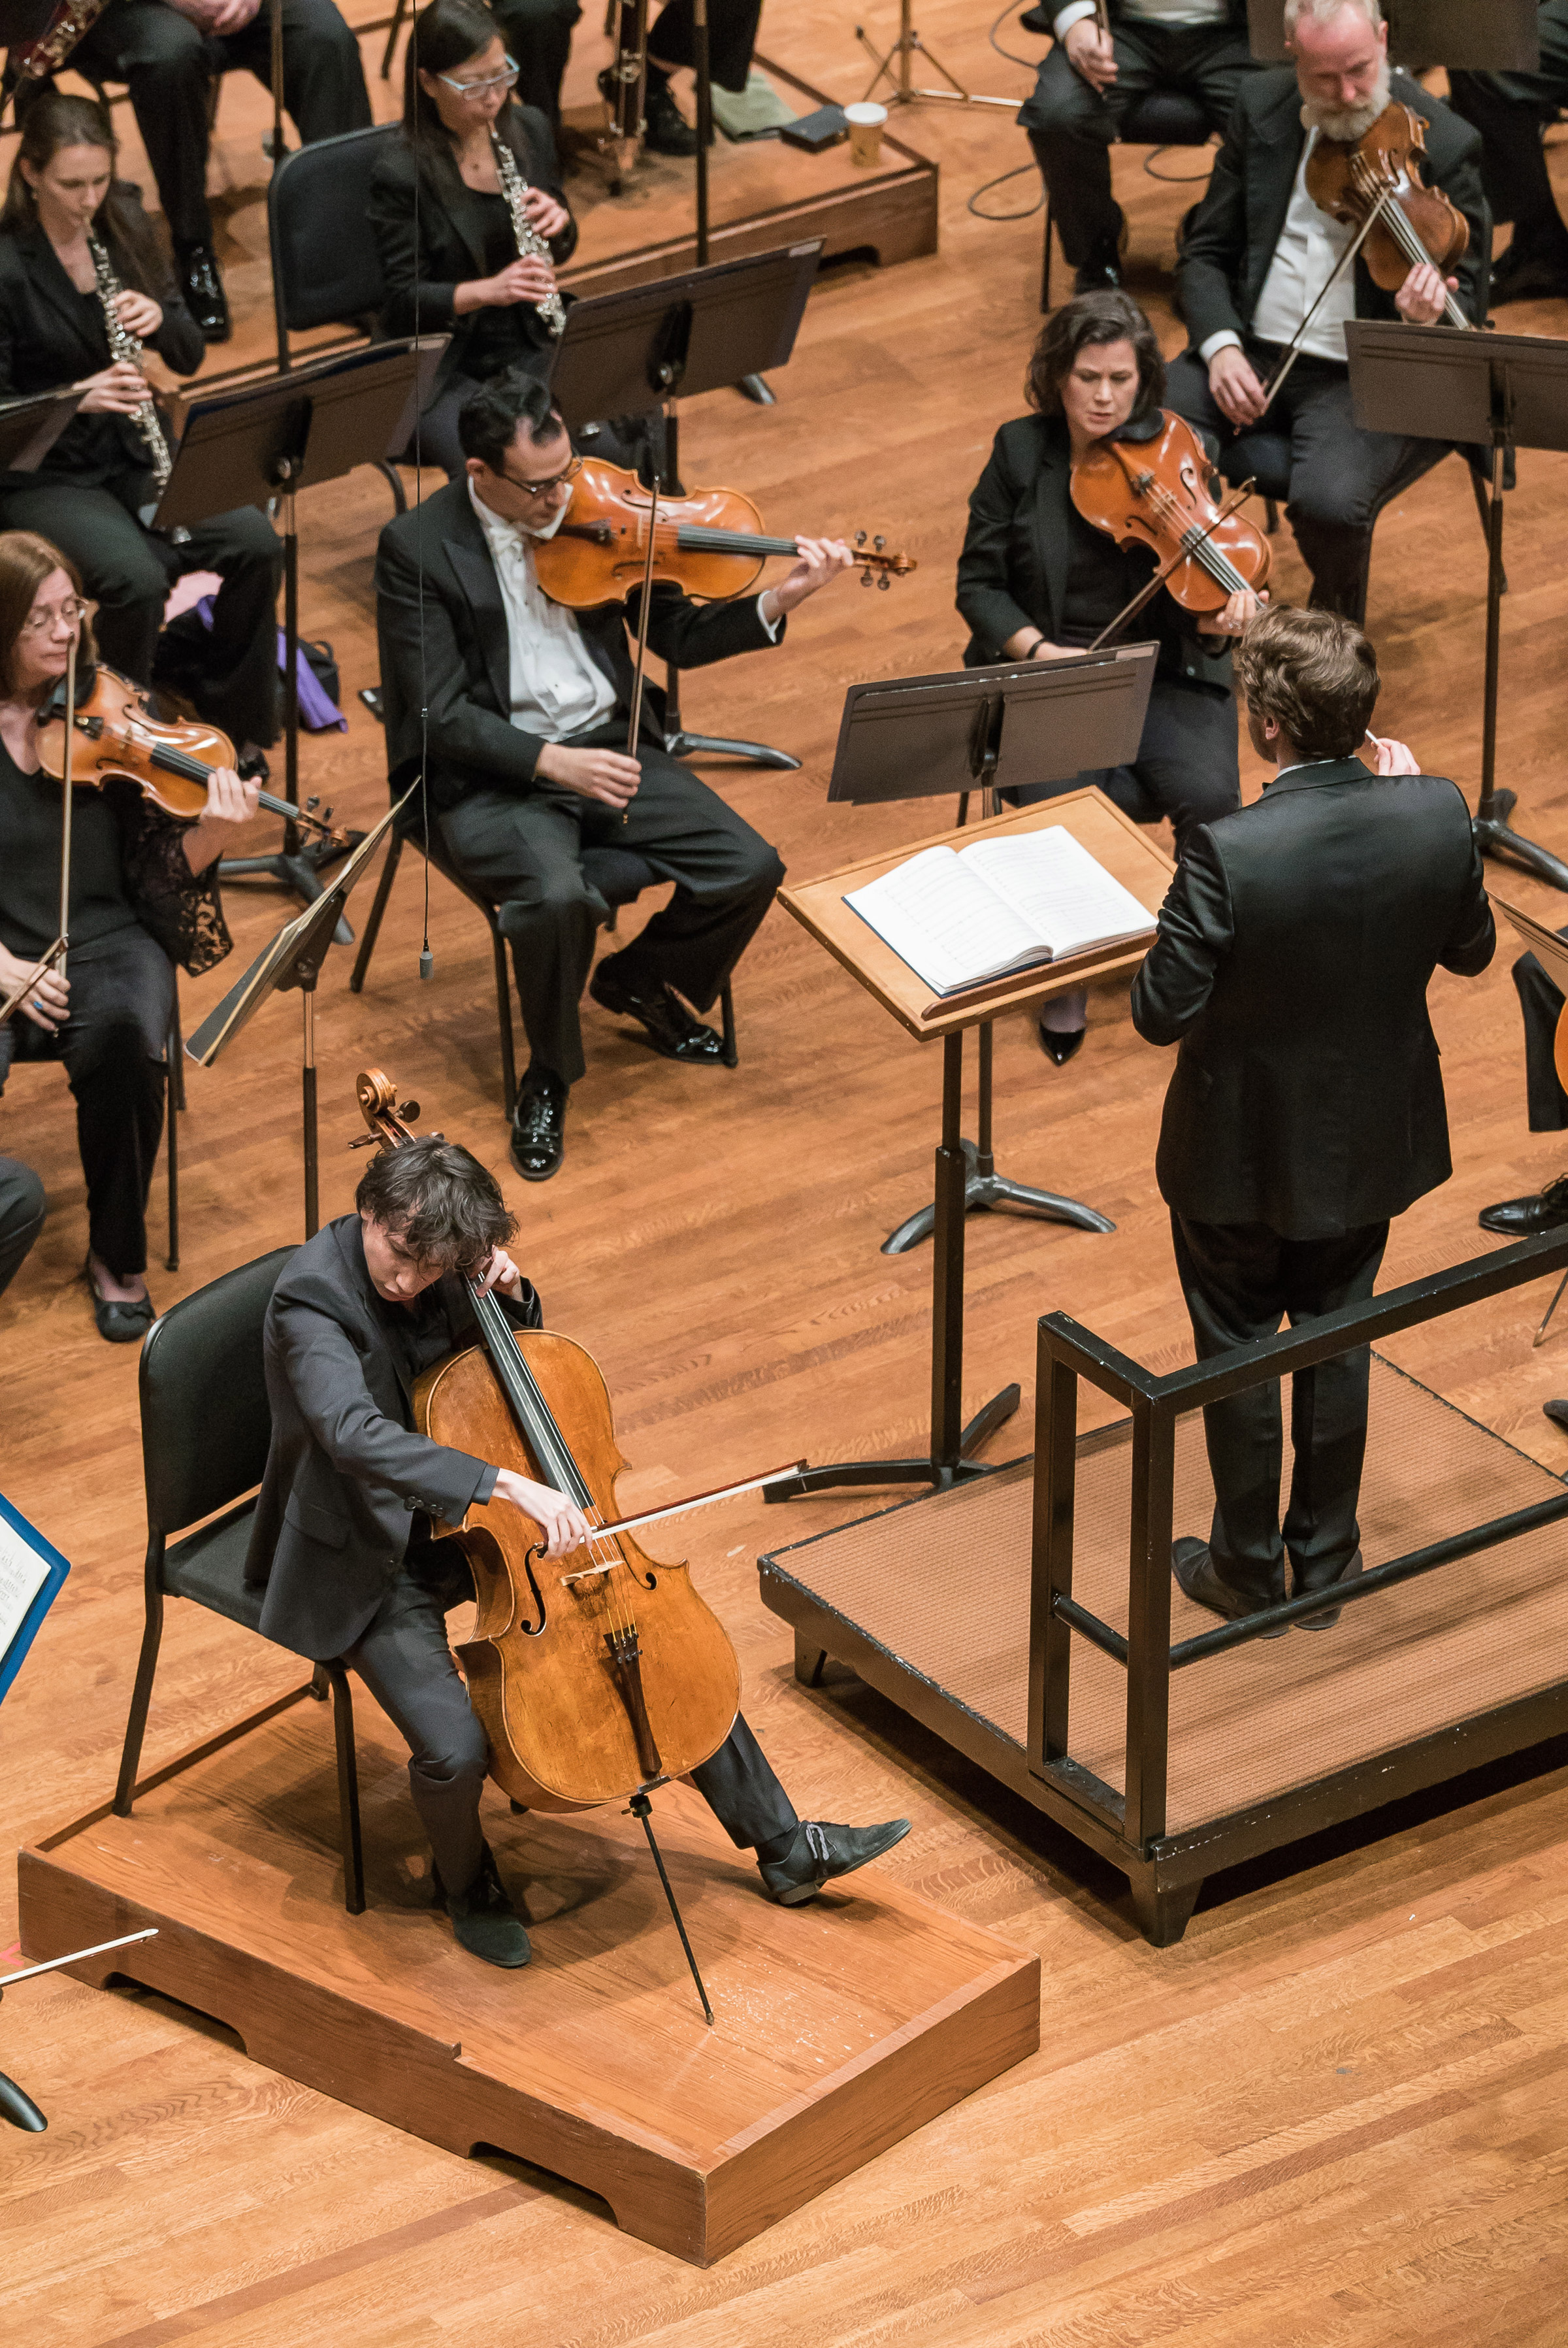 seattle-symphony-orchestra-brandon-patoc-pablo-broseta-03.JPG